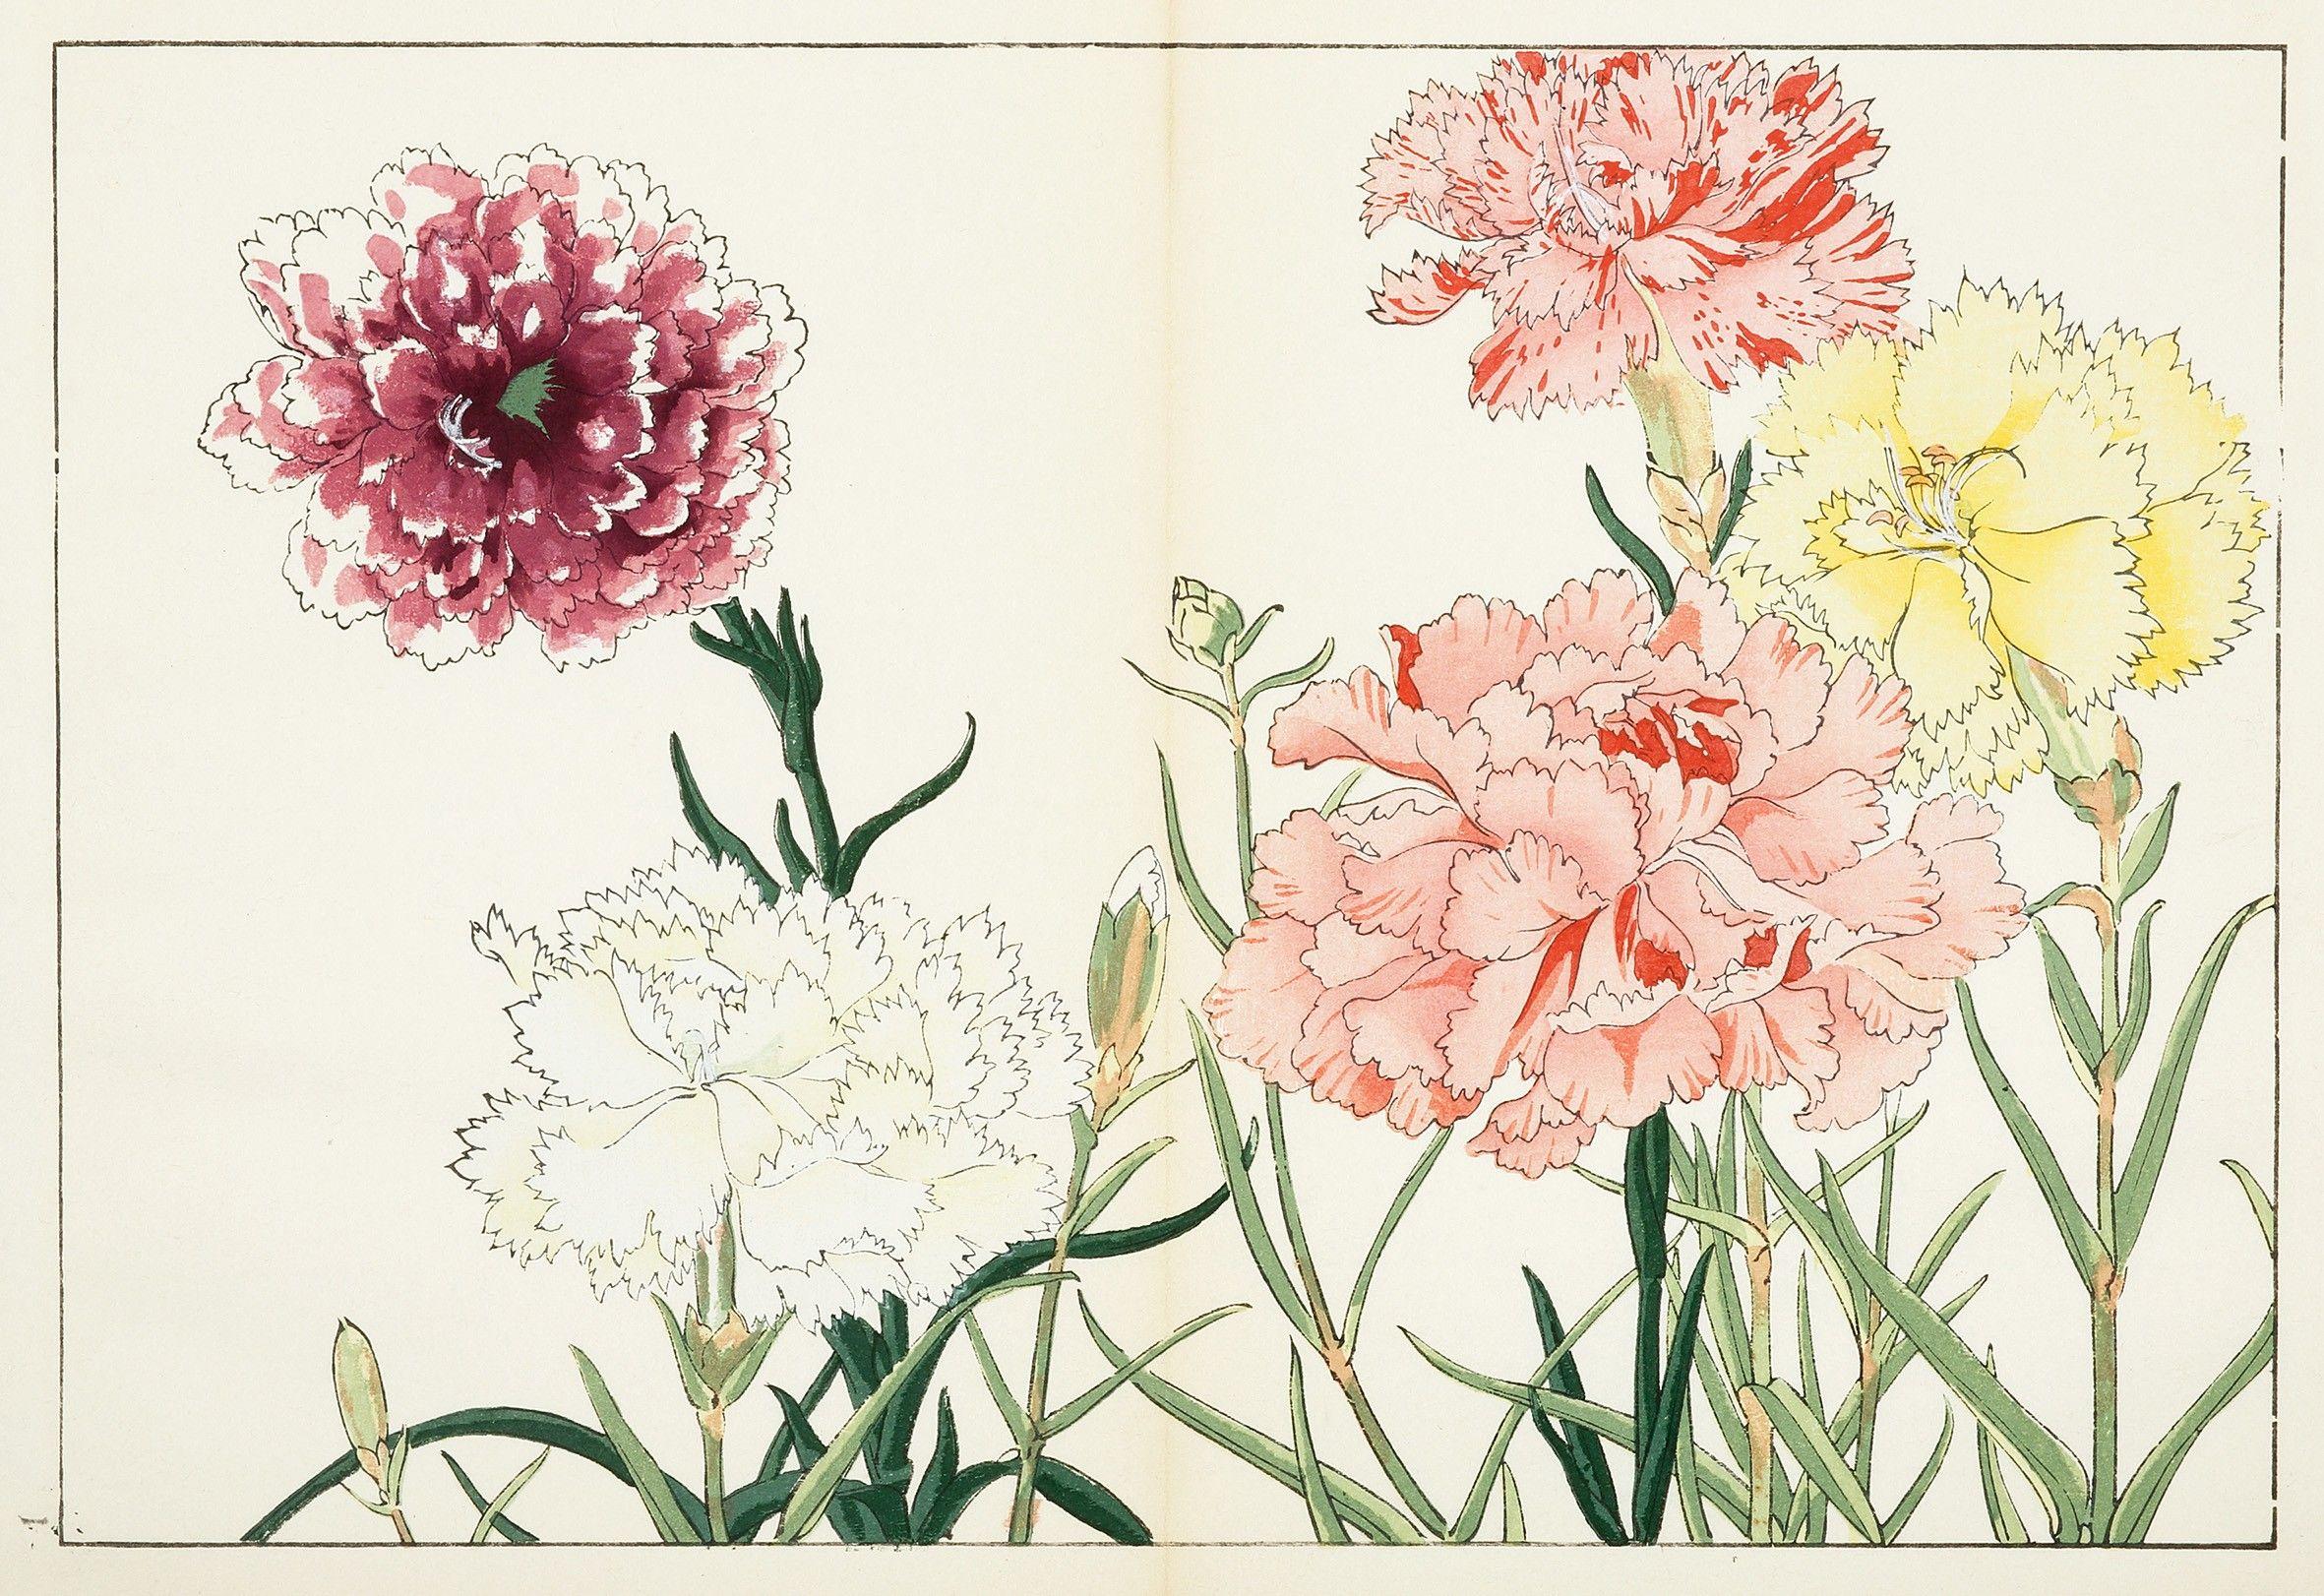 Carnation Antique Print Map Room Flower Illustration Japanese Art Styles Japanese Painting